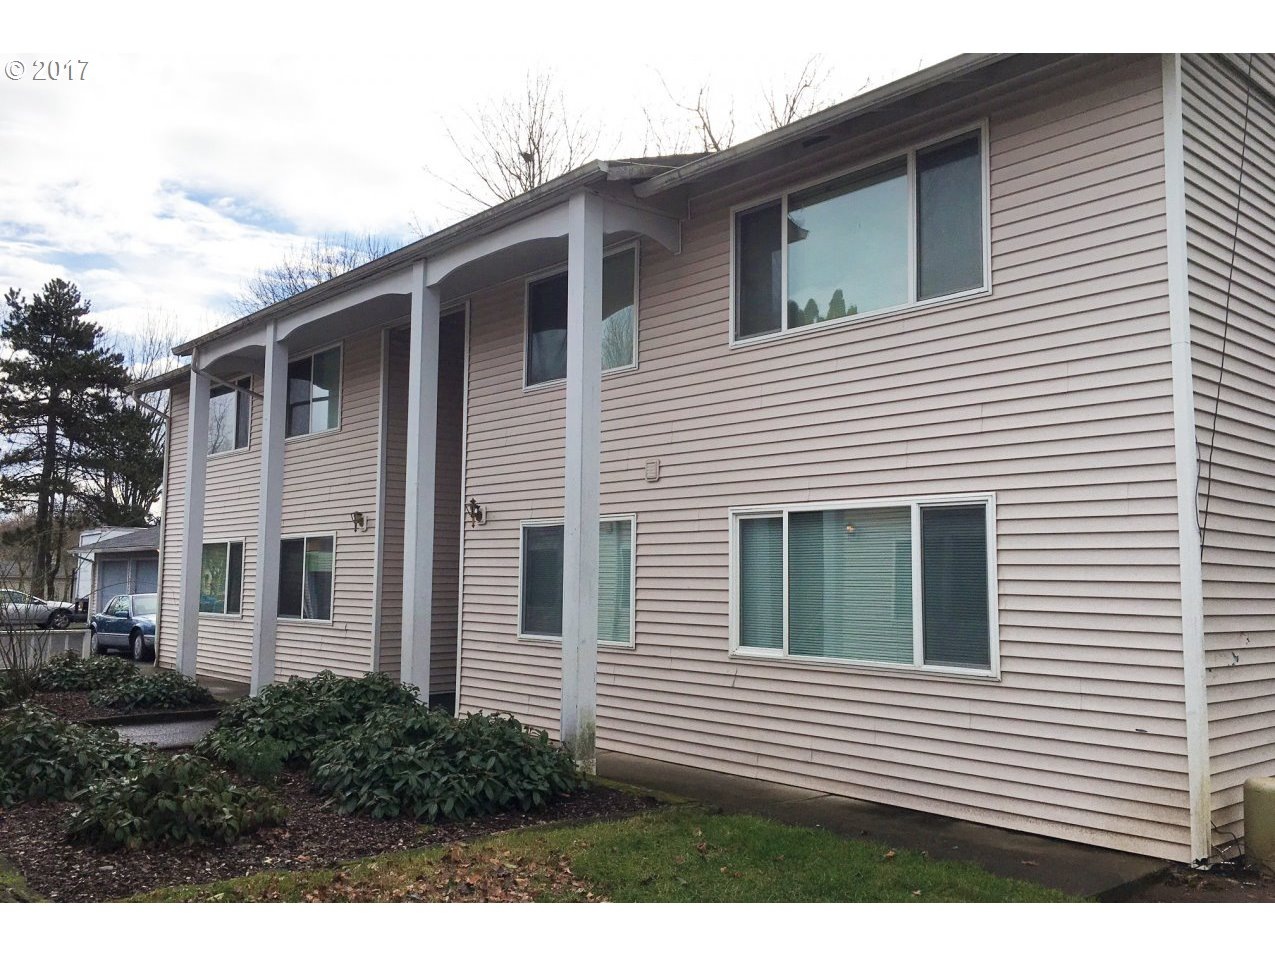 4416 GIBBONS ST, Vancouver, WA 98661